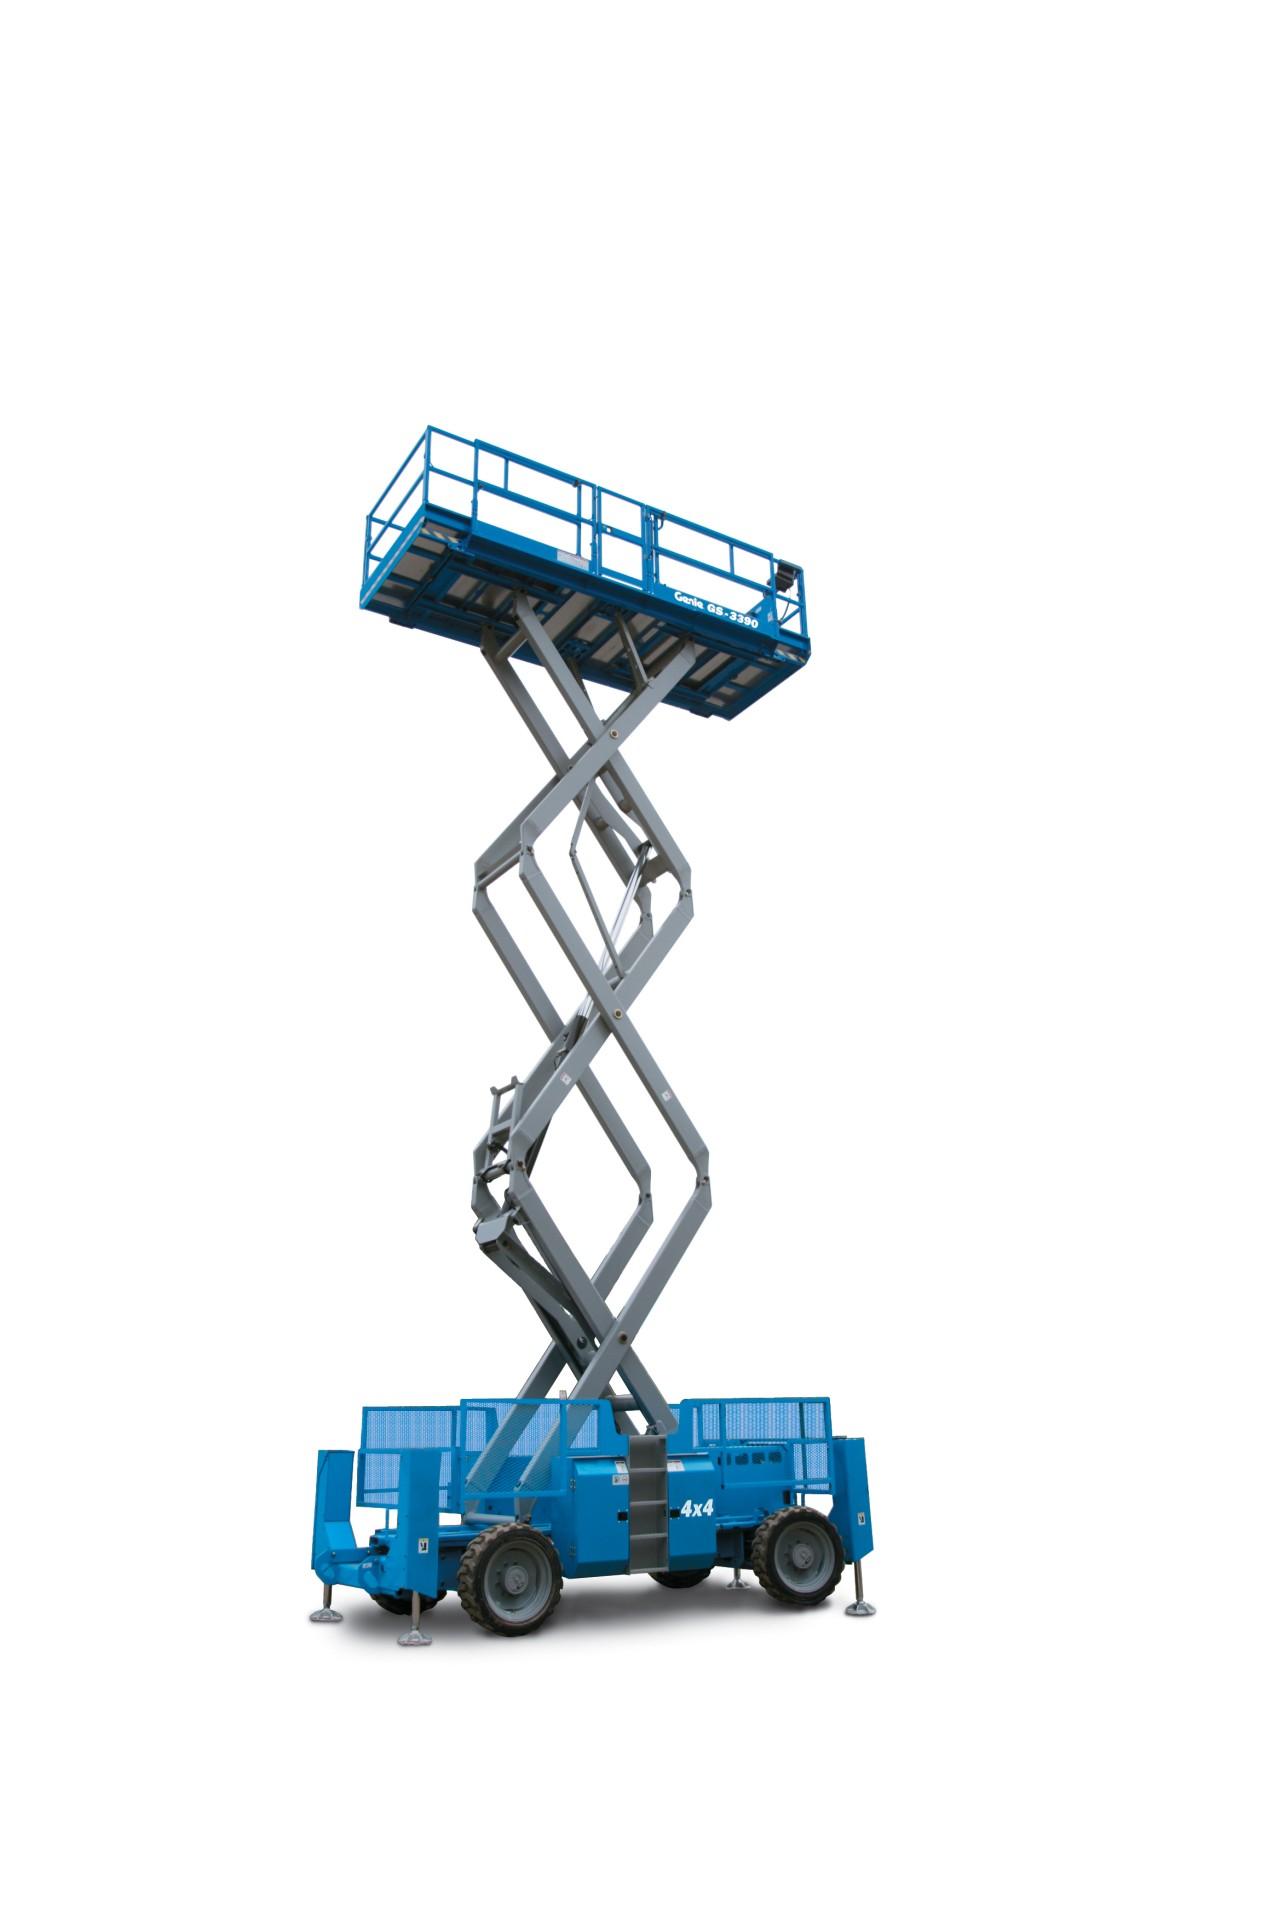 Genie GS-5390 RT Diesel